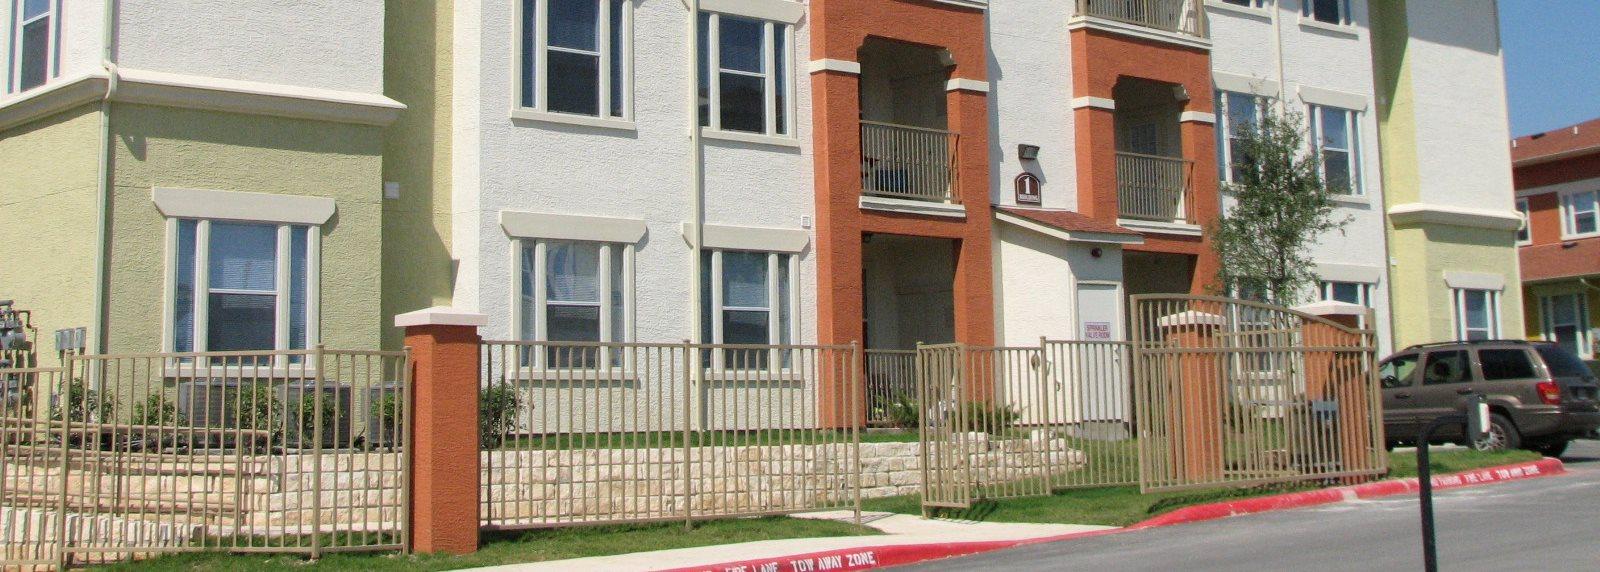 costa mirada apartments in san antonio tx